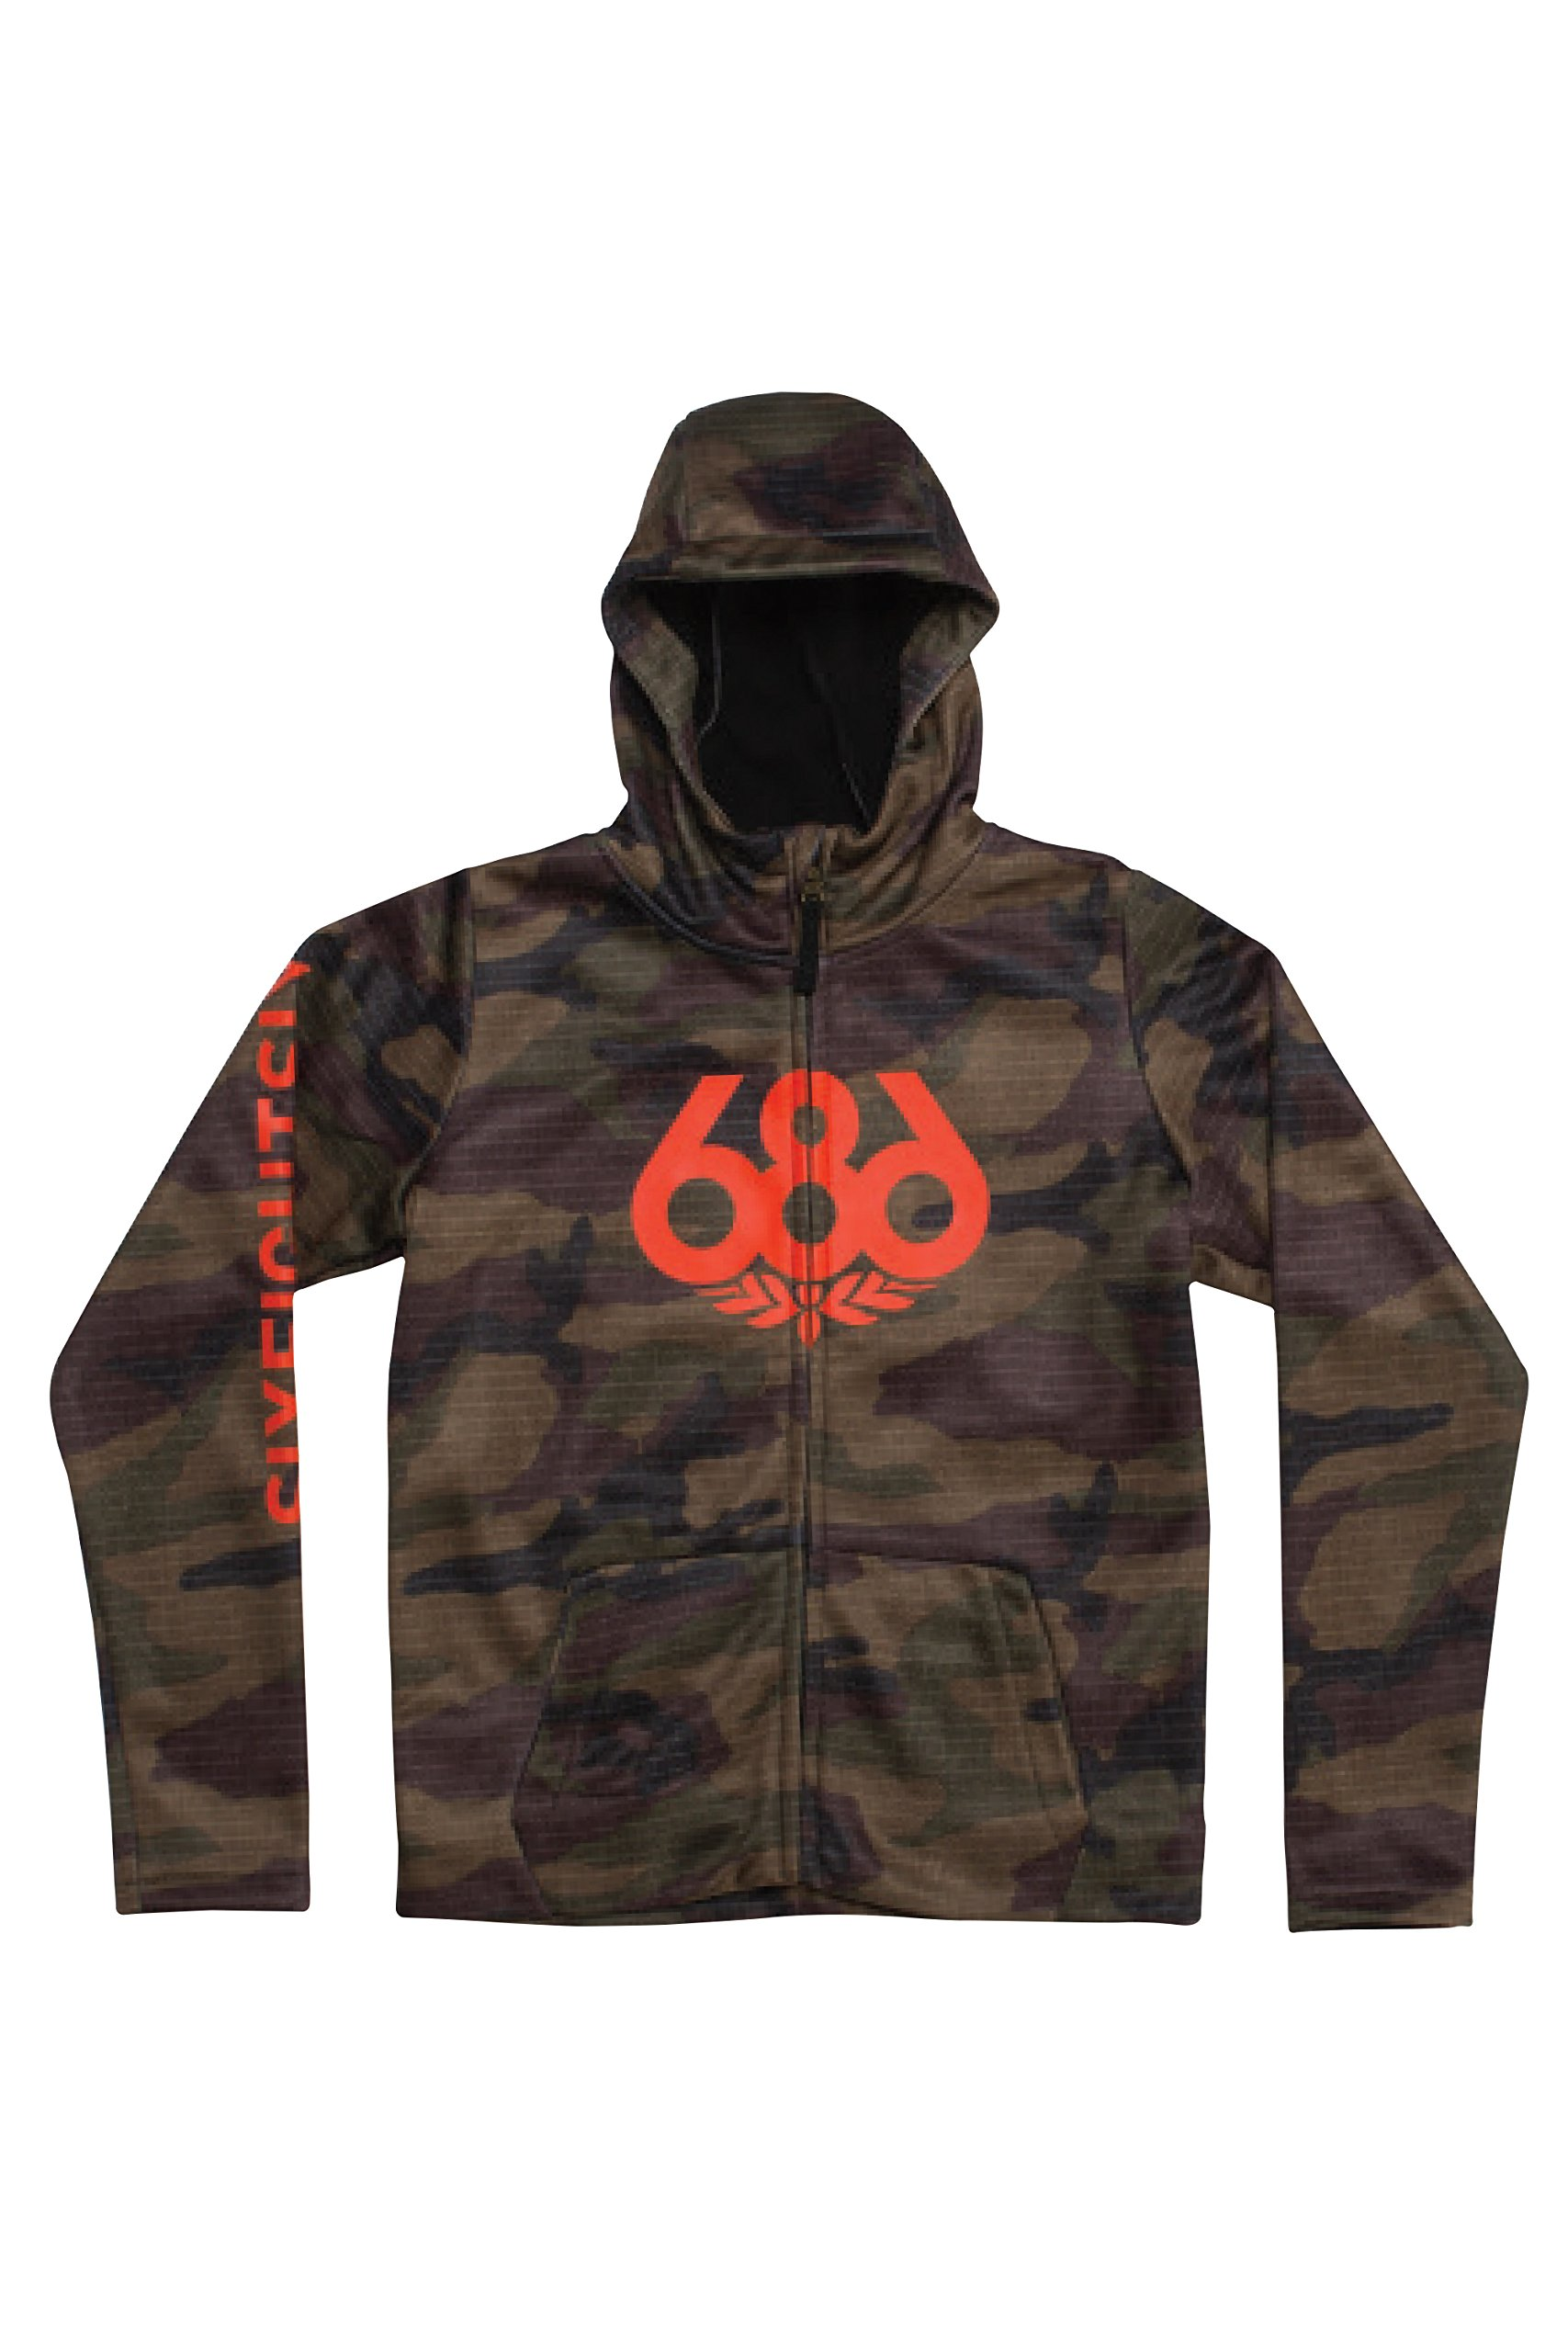 686 Boys' Bonded Zip-Up Hoody | Jersey and Fleece Backed Jacket | Dark Camo - L